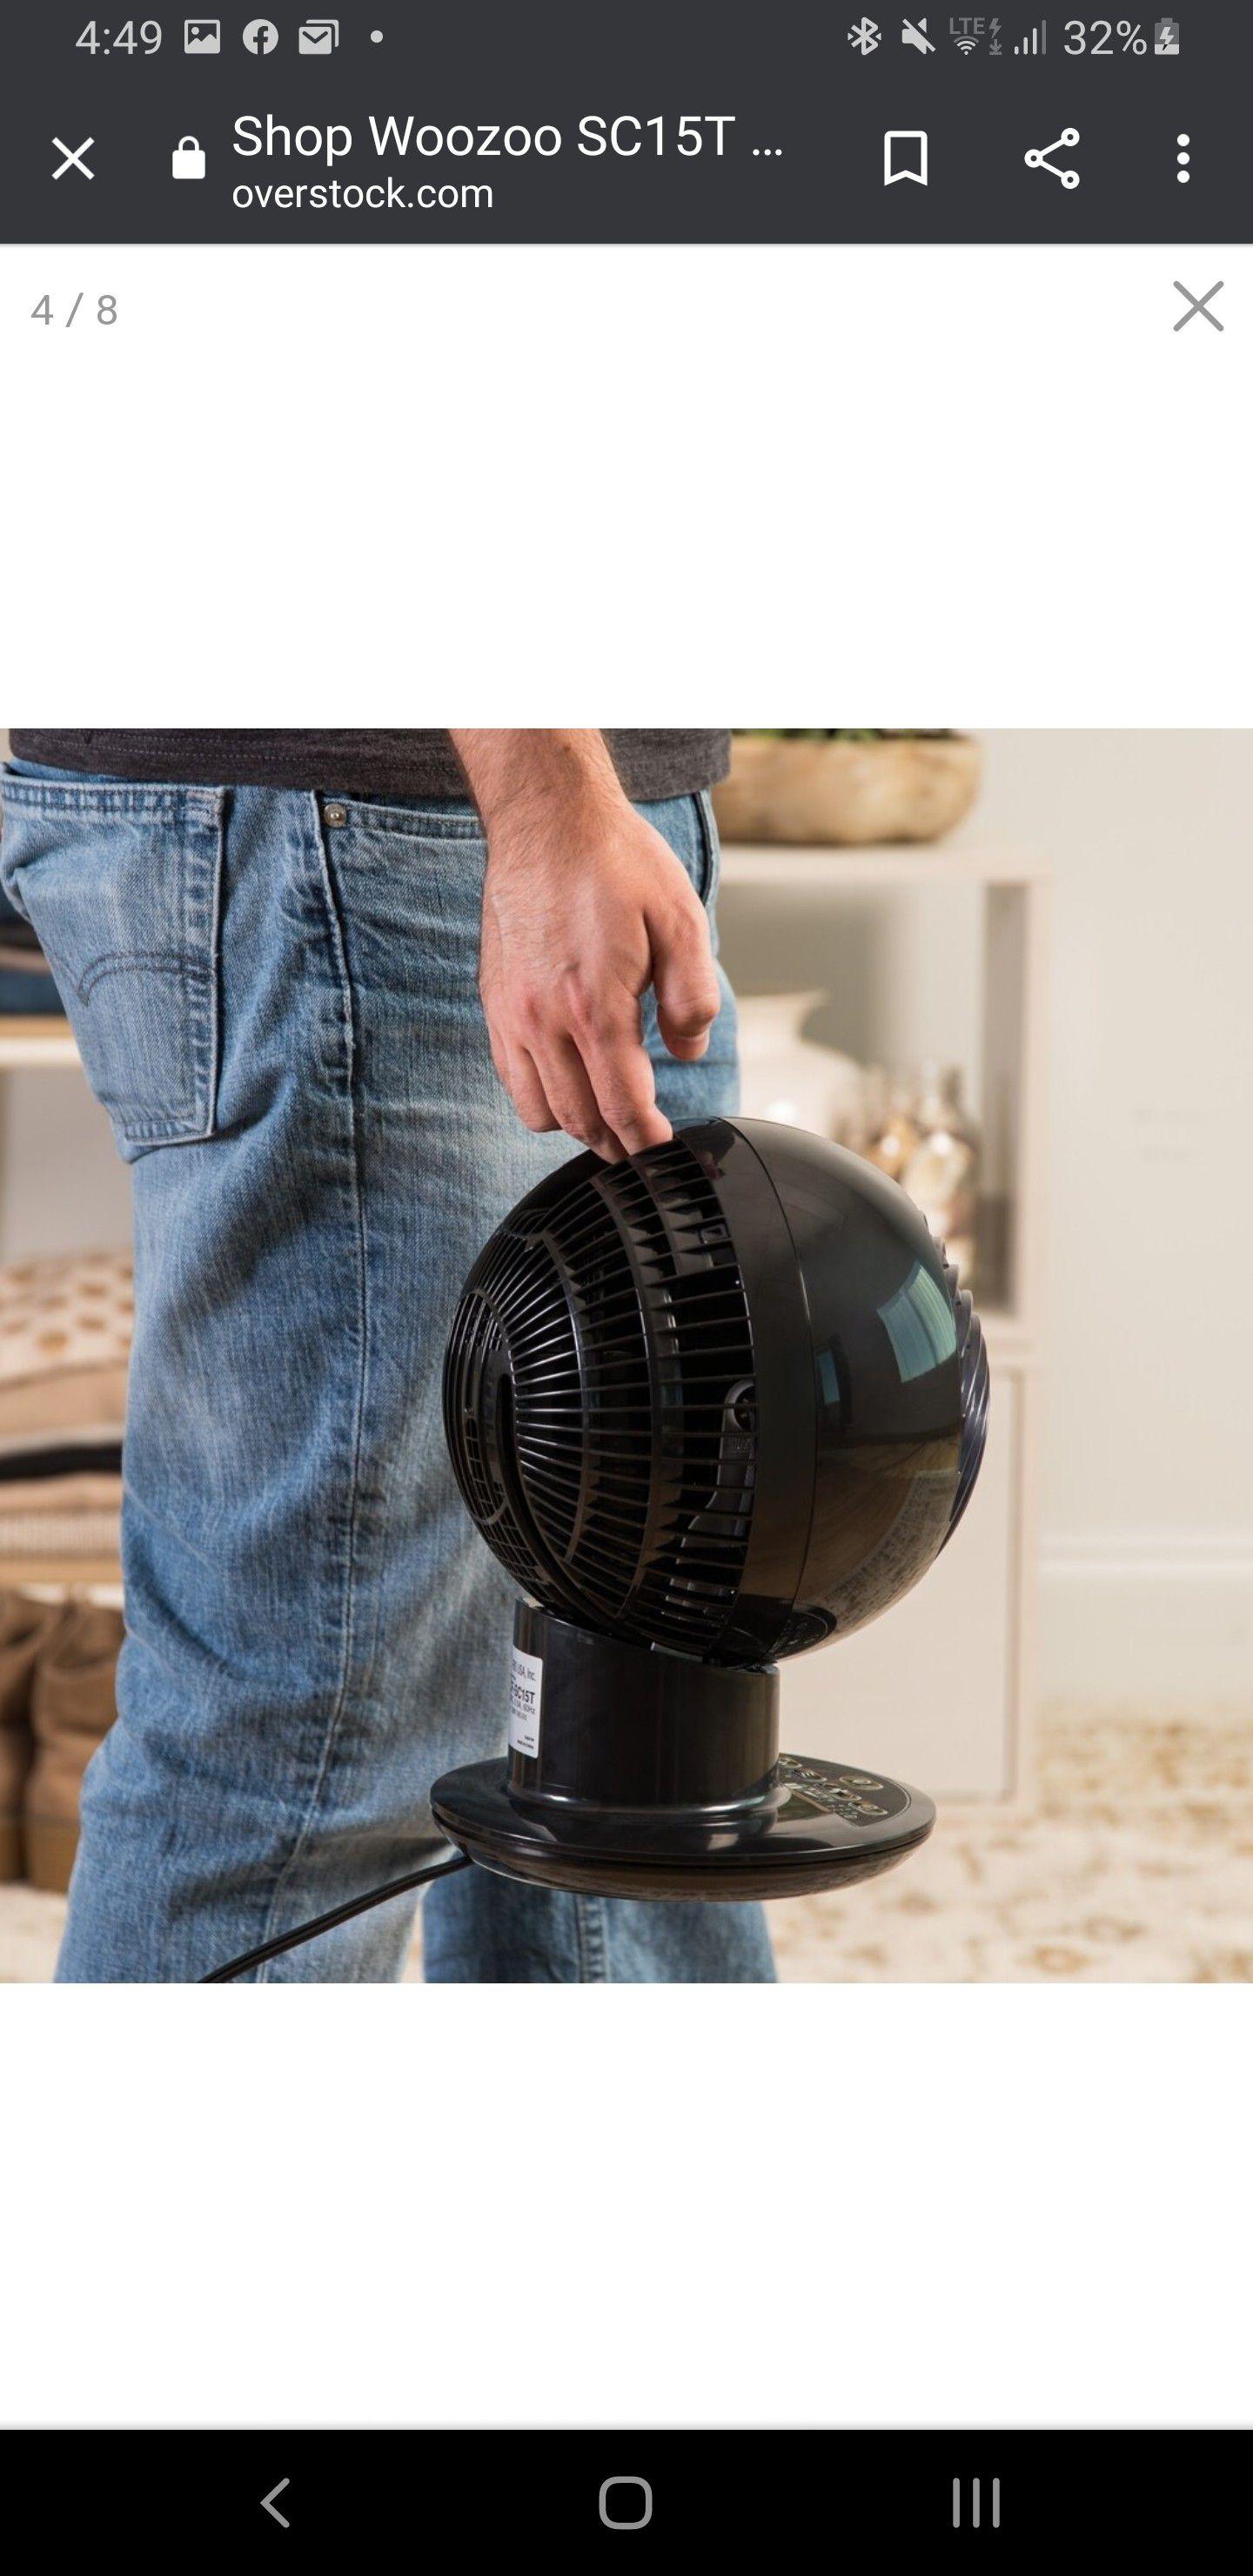 Woozoo globe oscillating fan